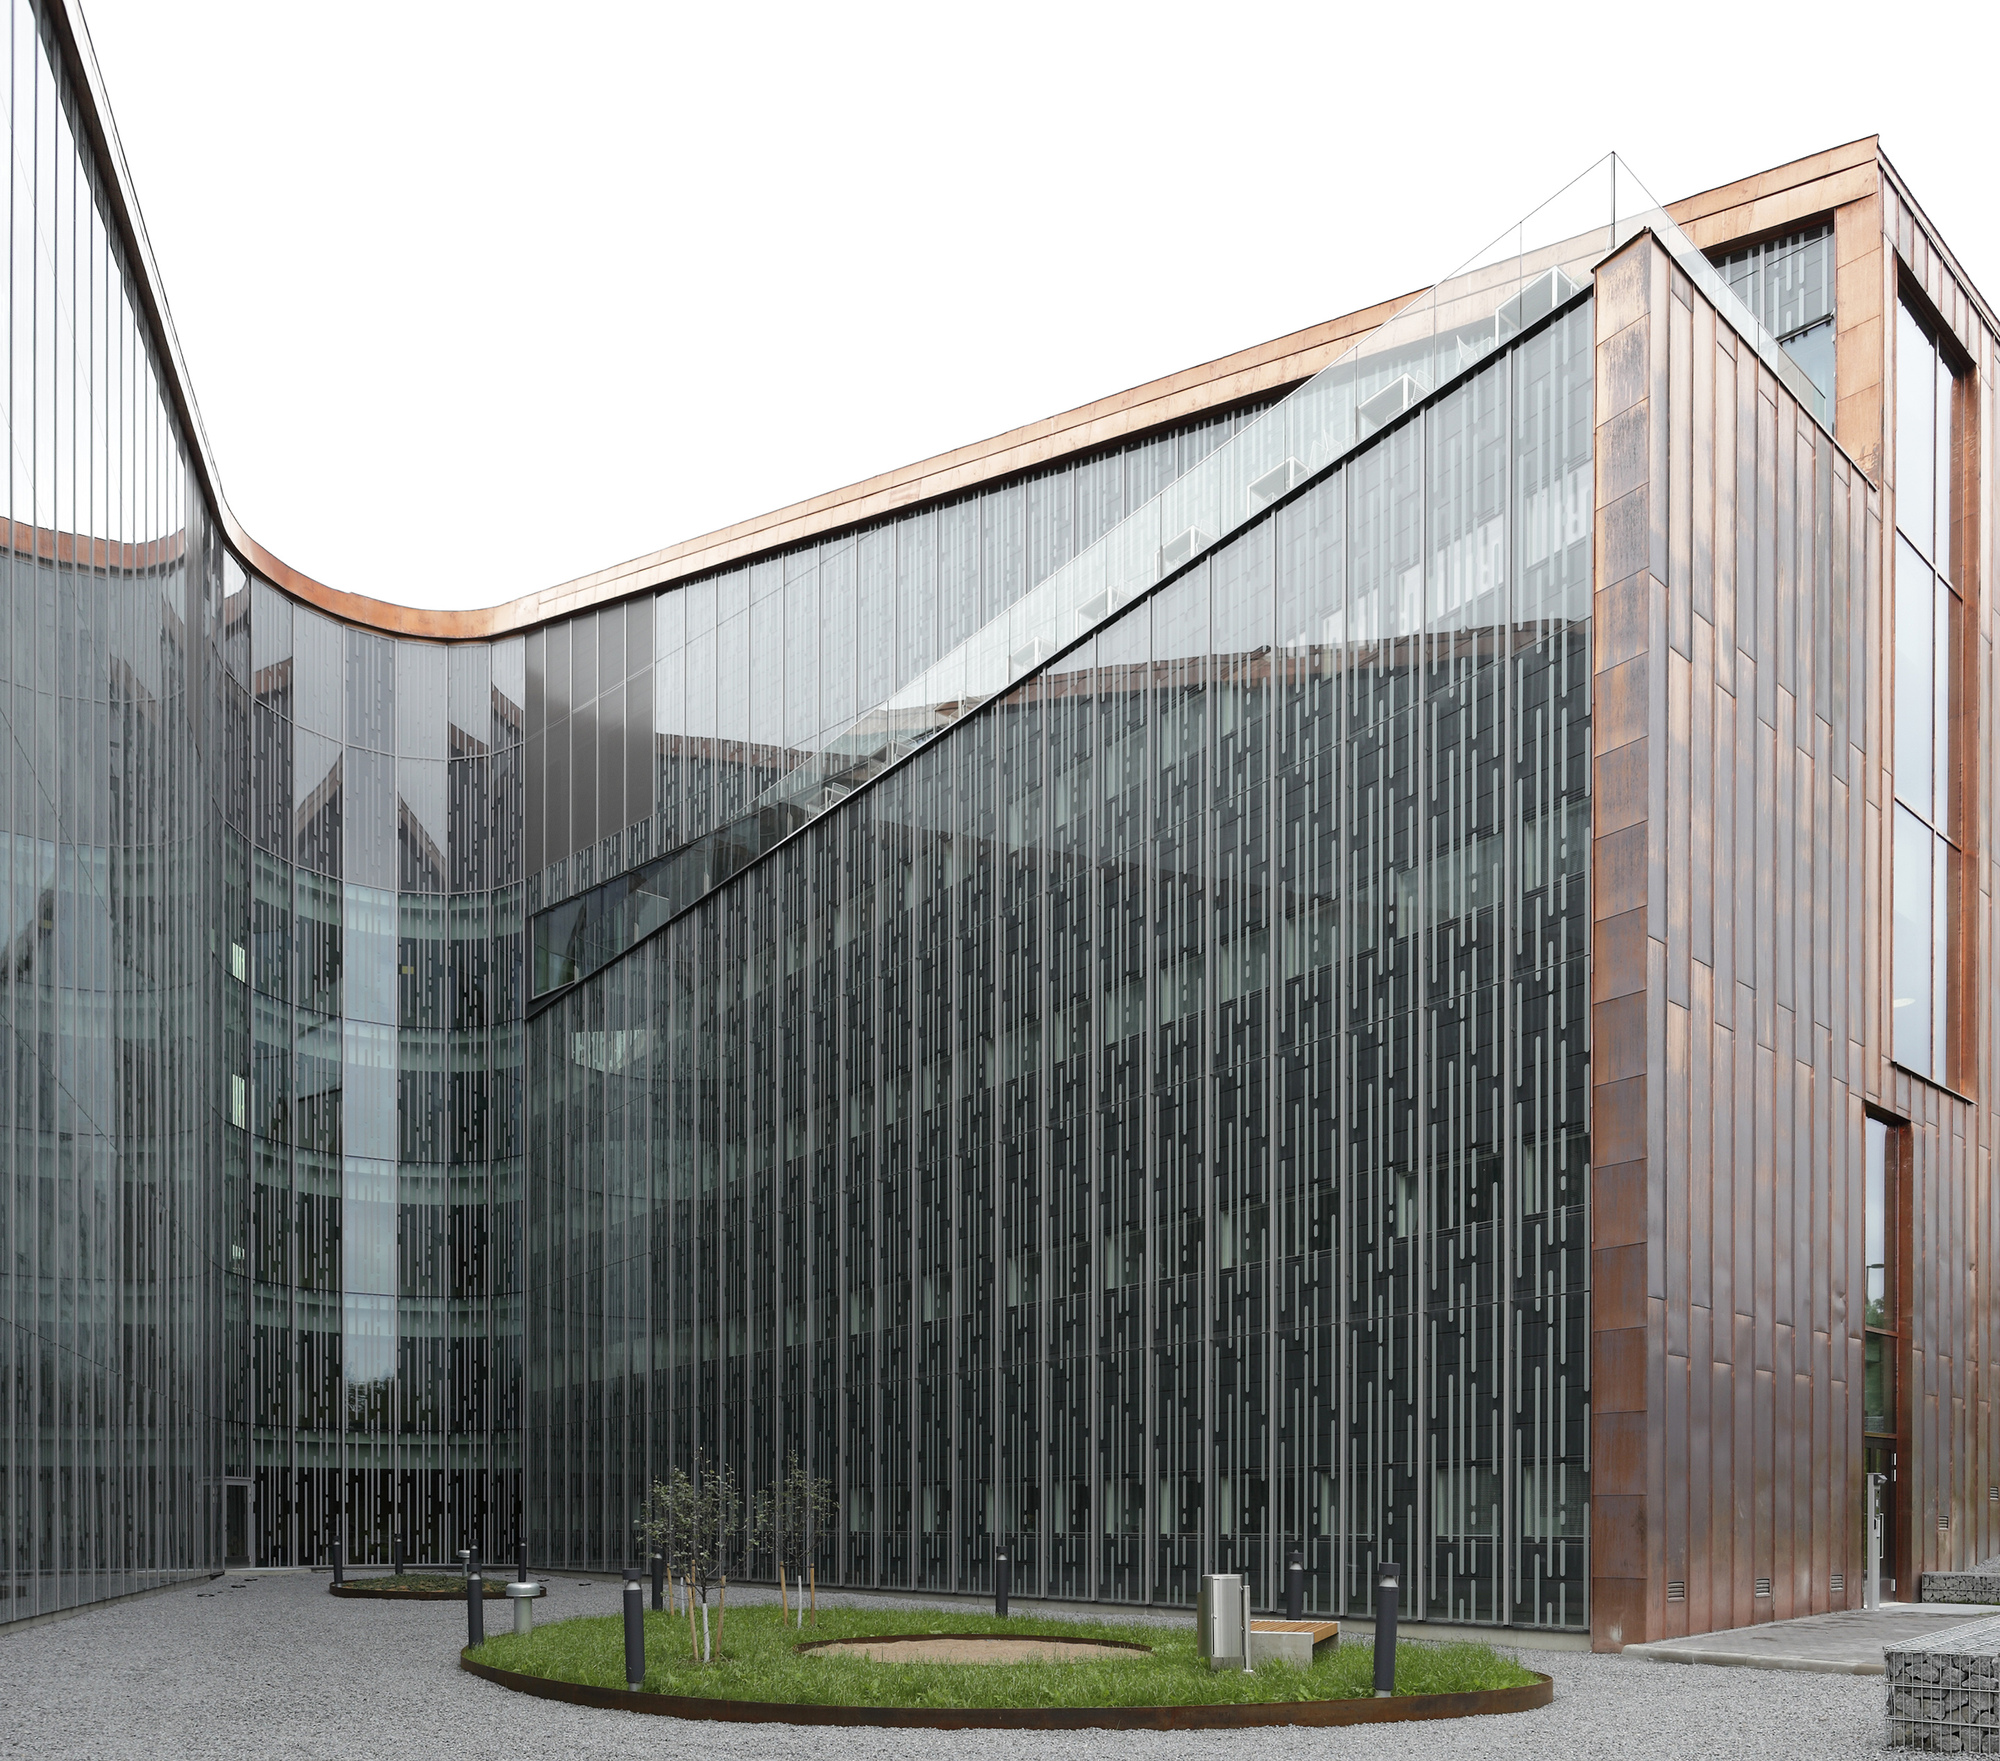 Centro de salud Tipotie / Sigge Arkkitehdit Oy